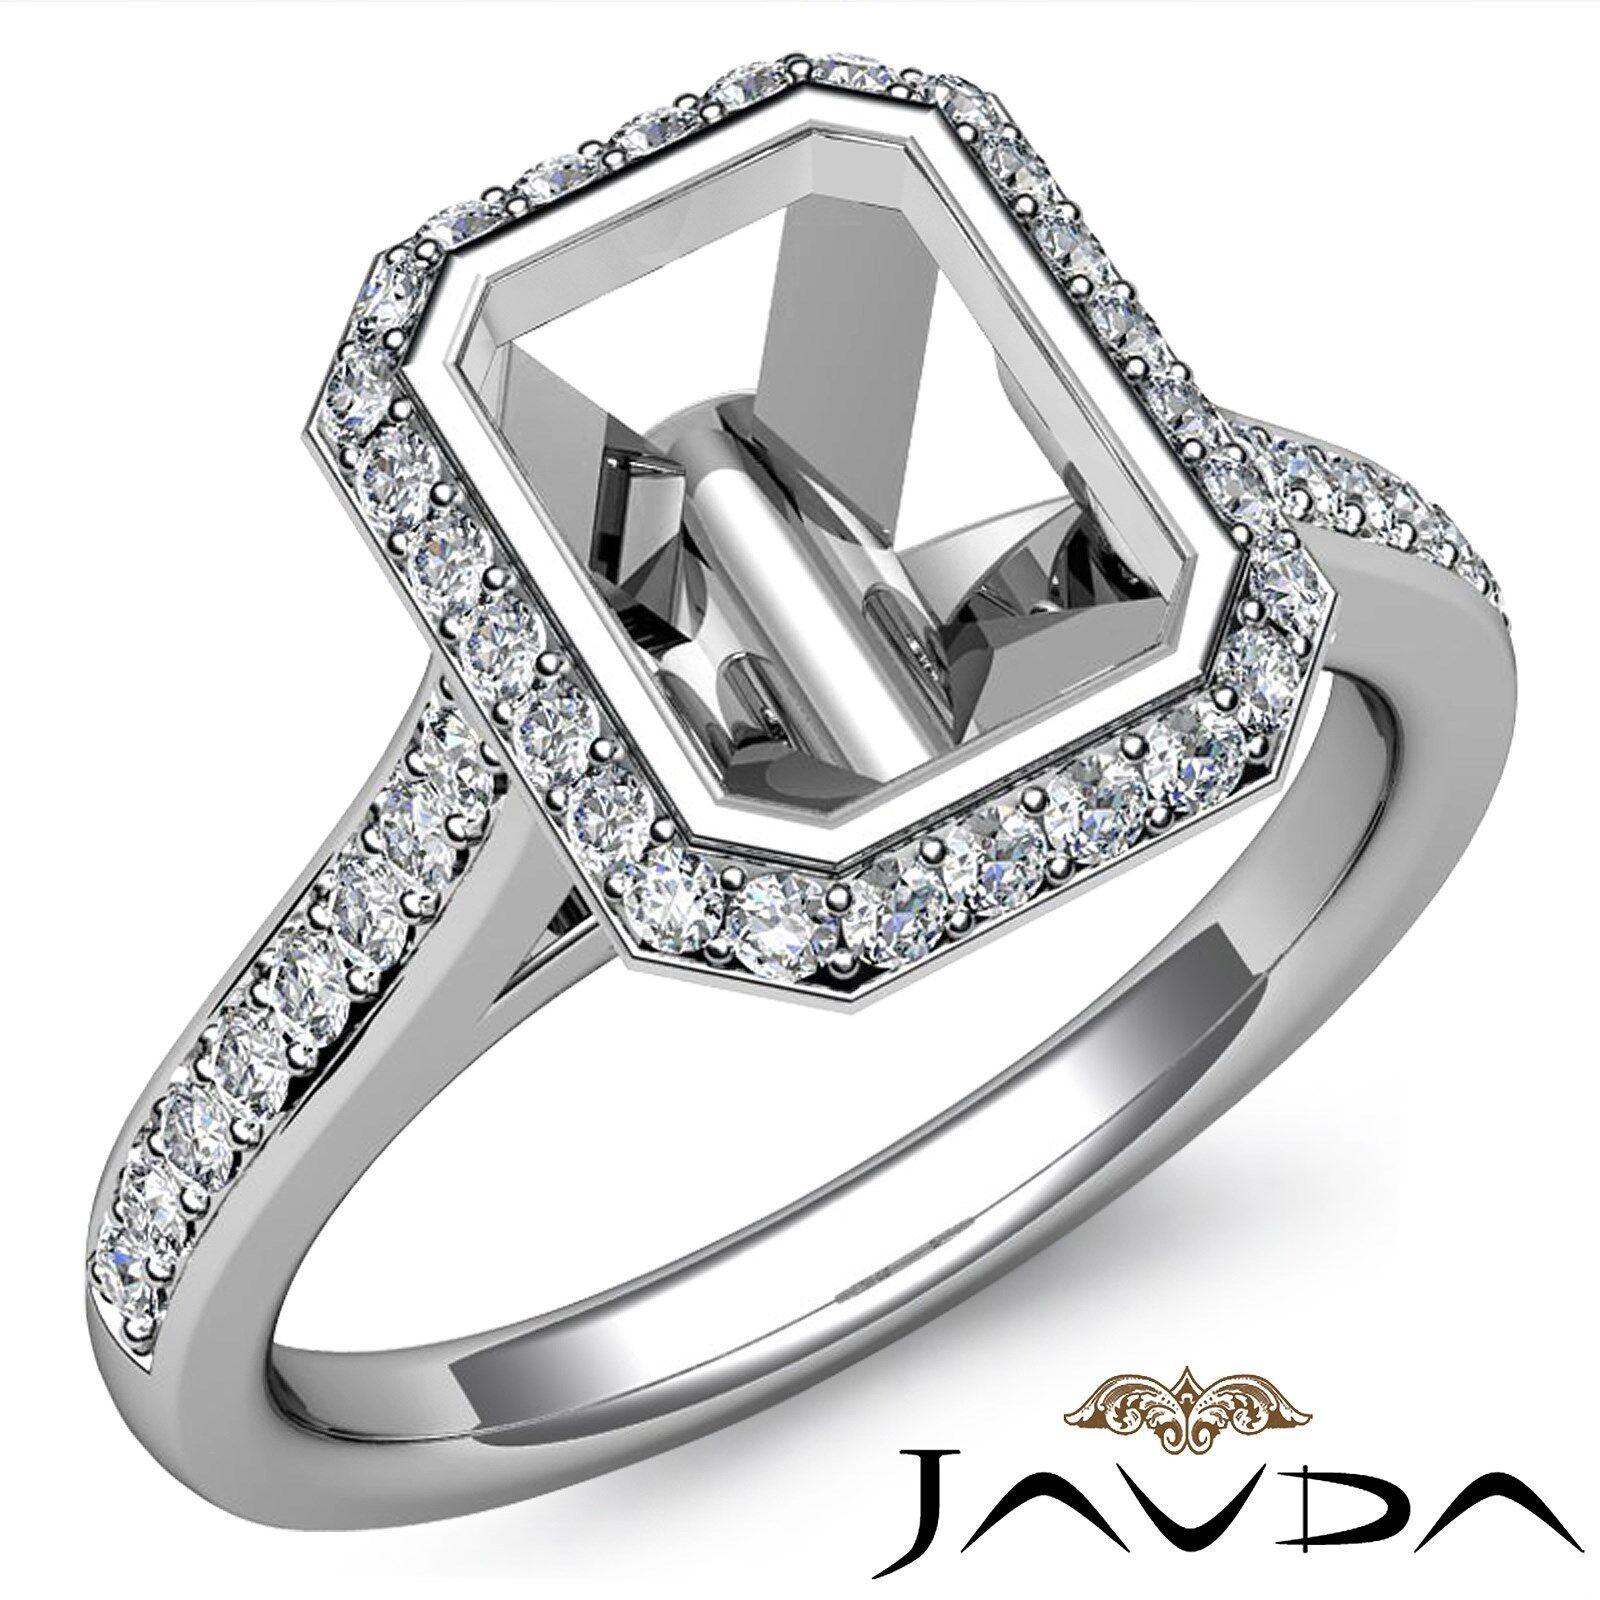 6544ccd8e766d White Ring Engagement Diamond gold 14k Mount Semi 0.8Ct Set Bezel ...